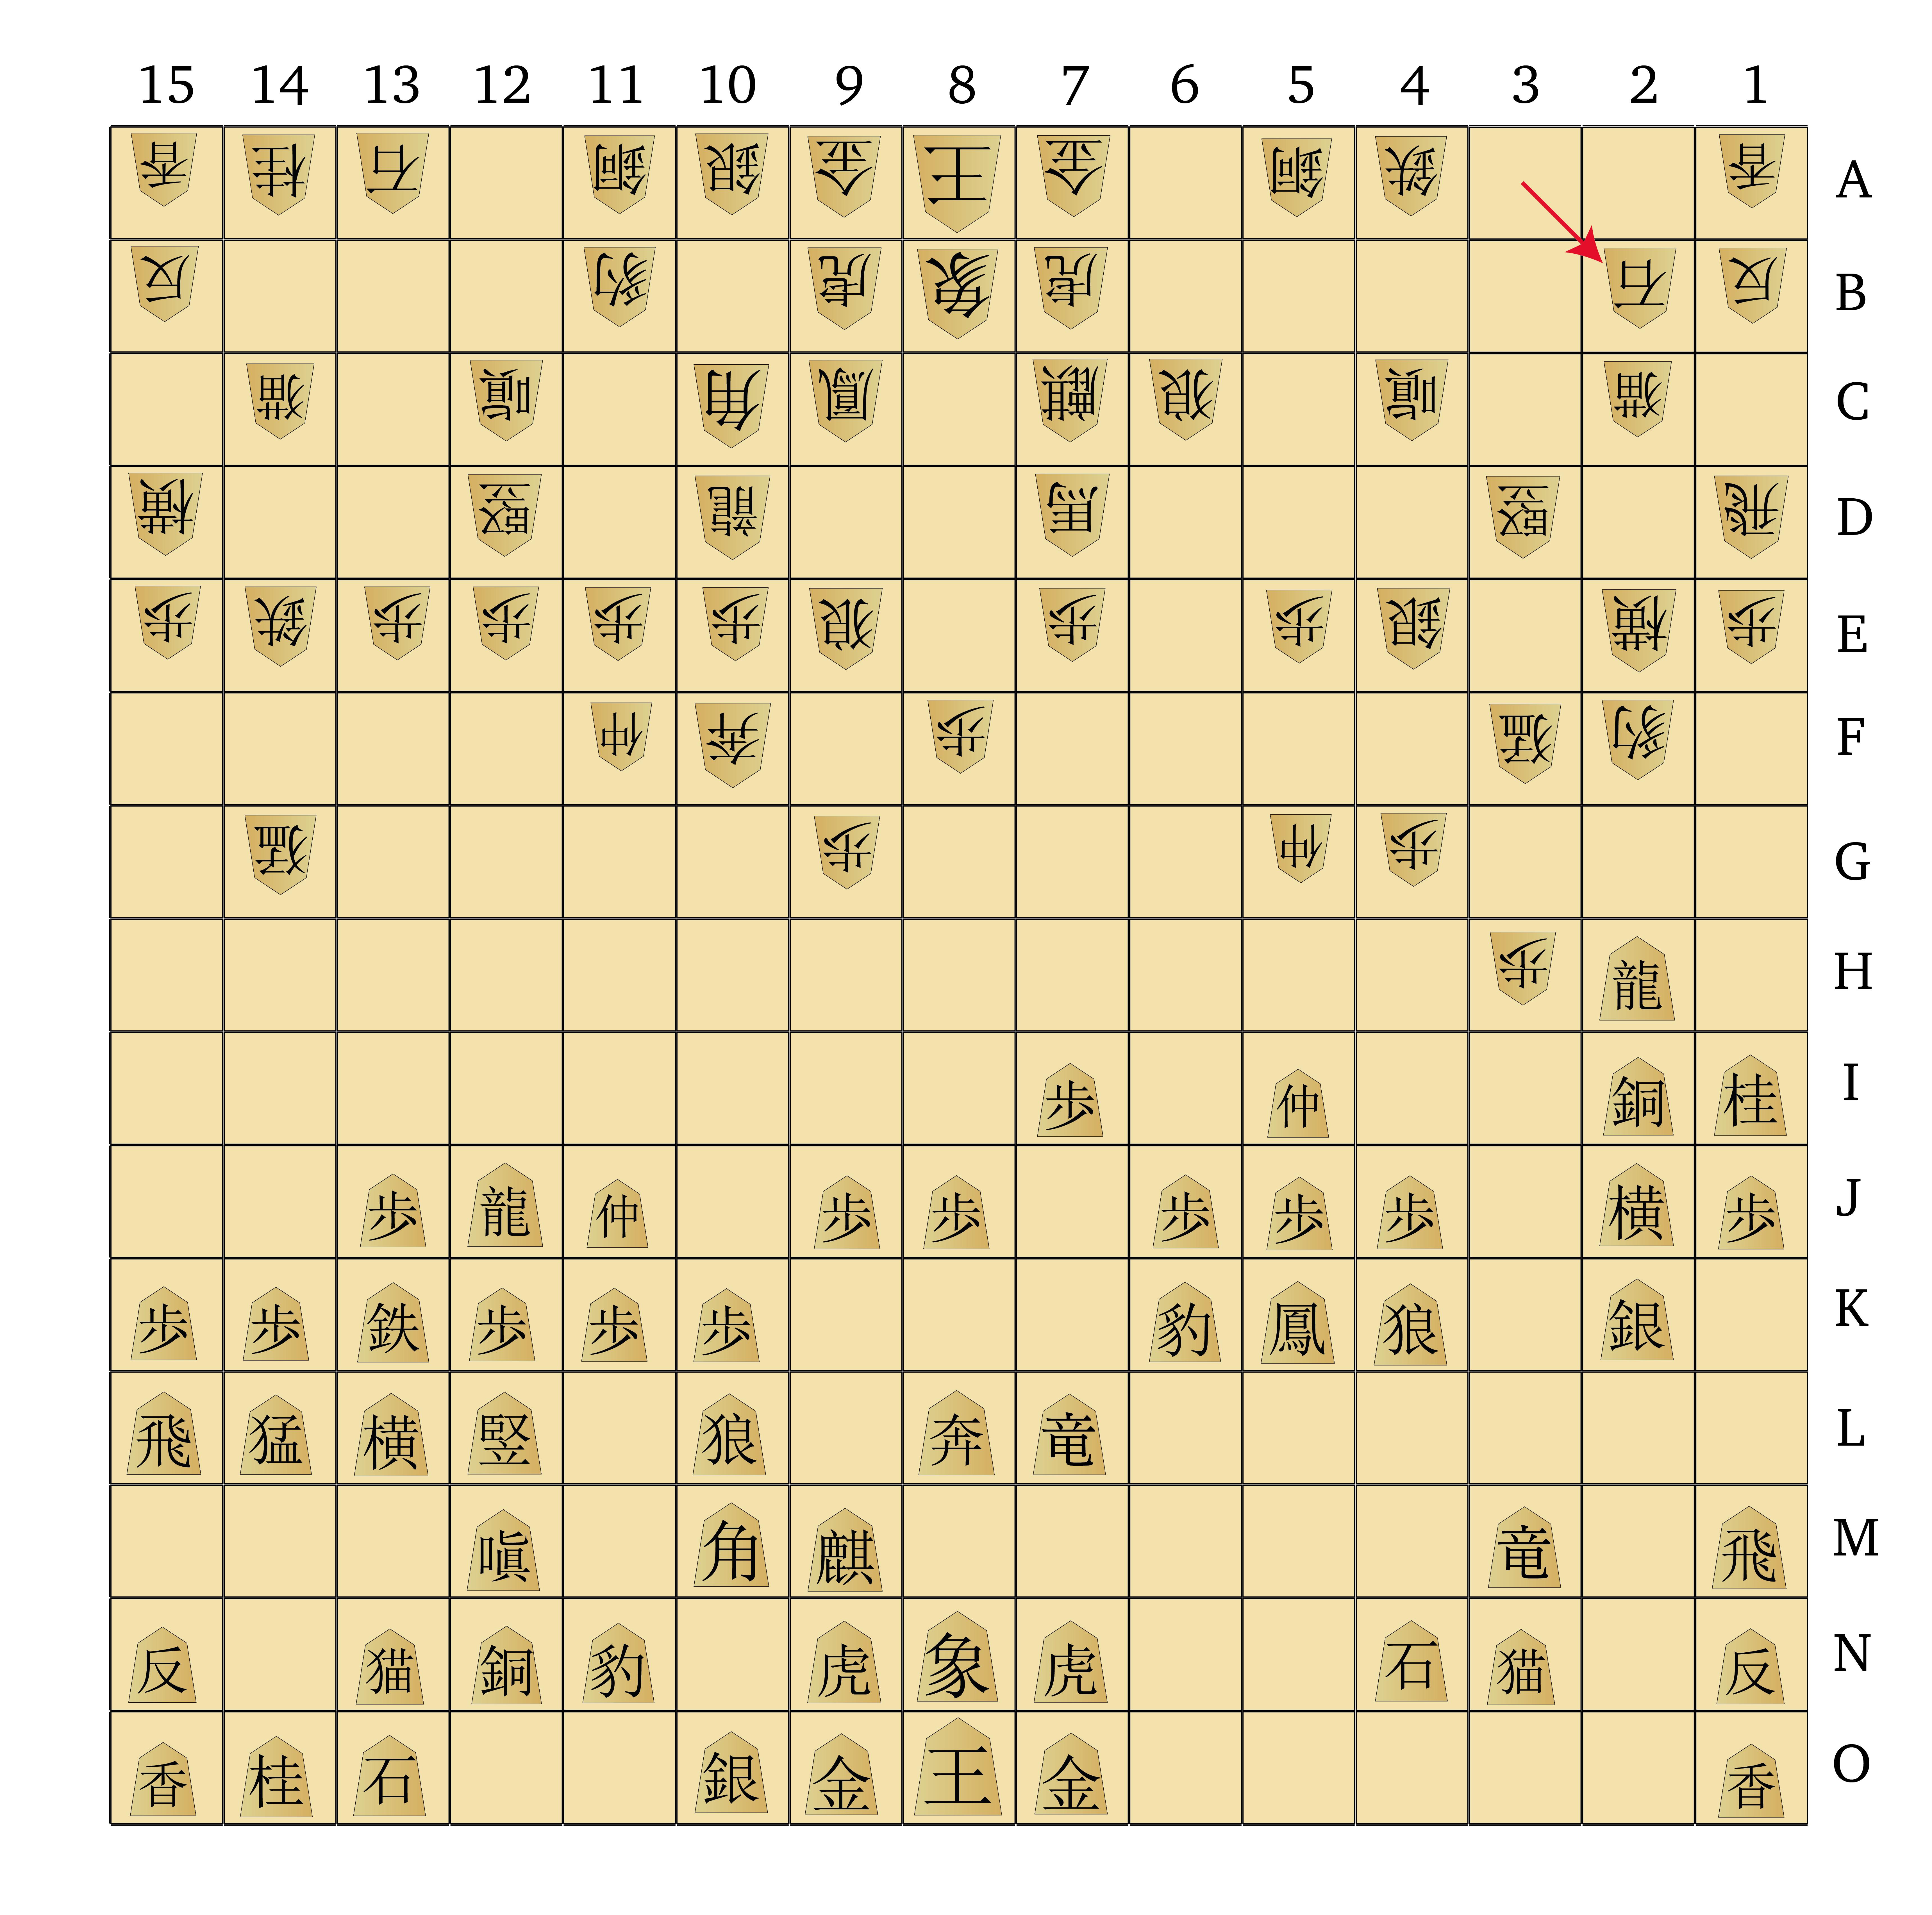 Dai Shogi 420 -- Move 160-01